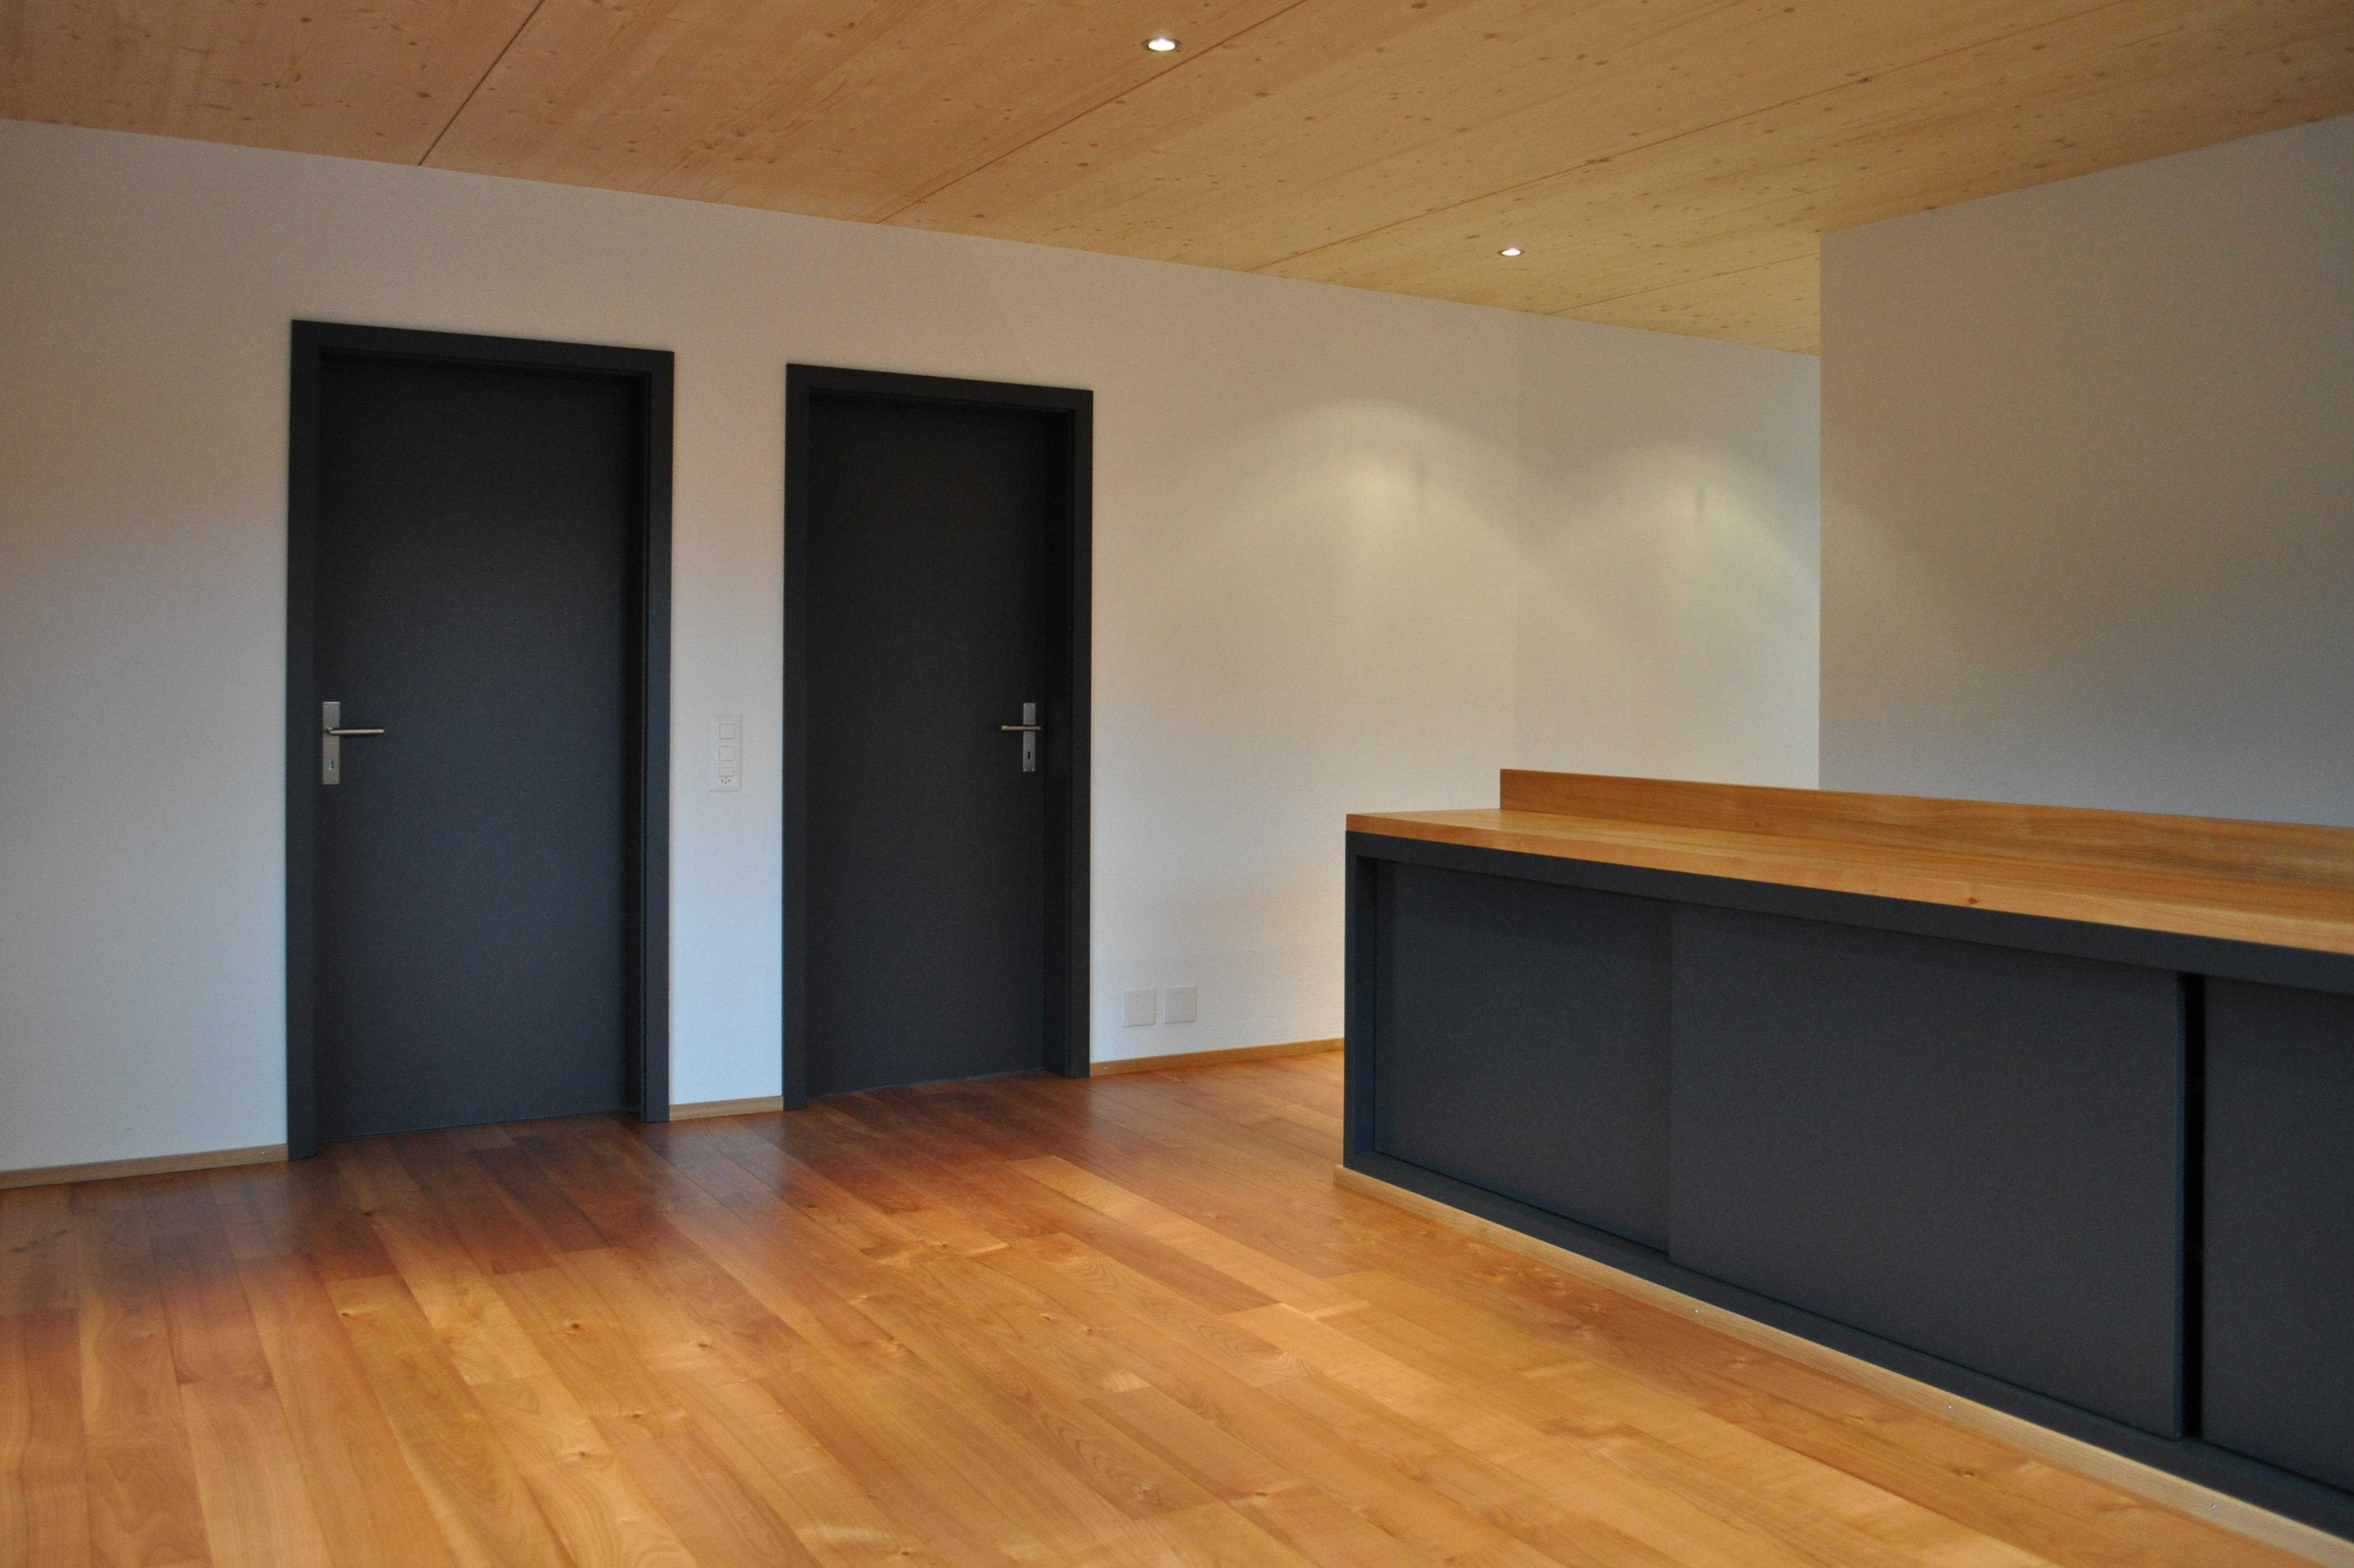 hpl vollkernplatten ihr holzhaus von pm mangold ag. Black Bedroom Furniture Sets. Home Design Ideas